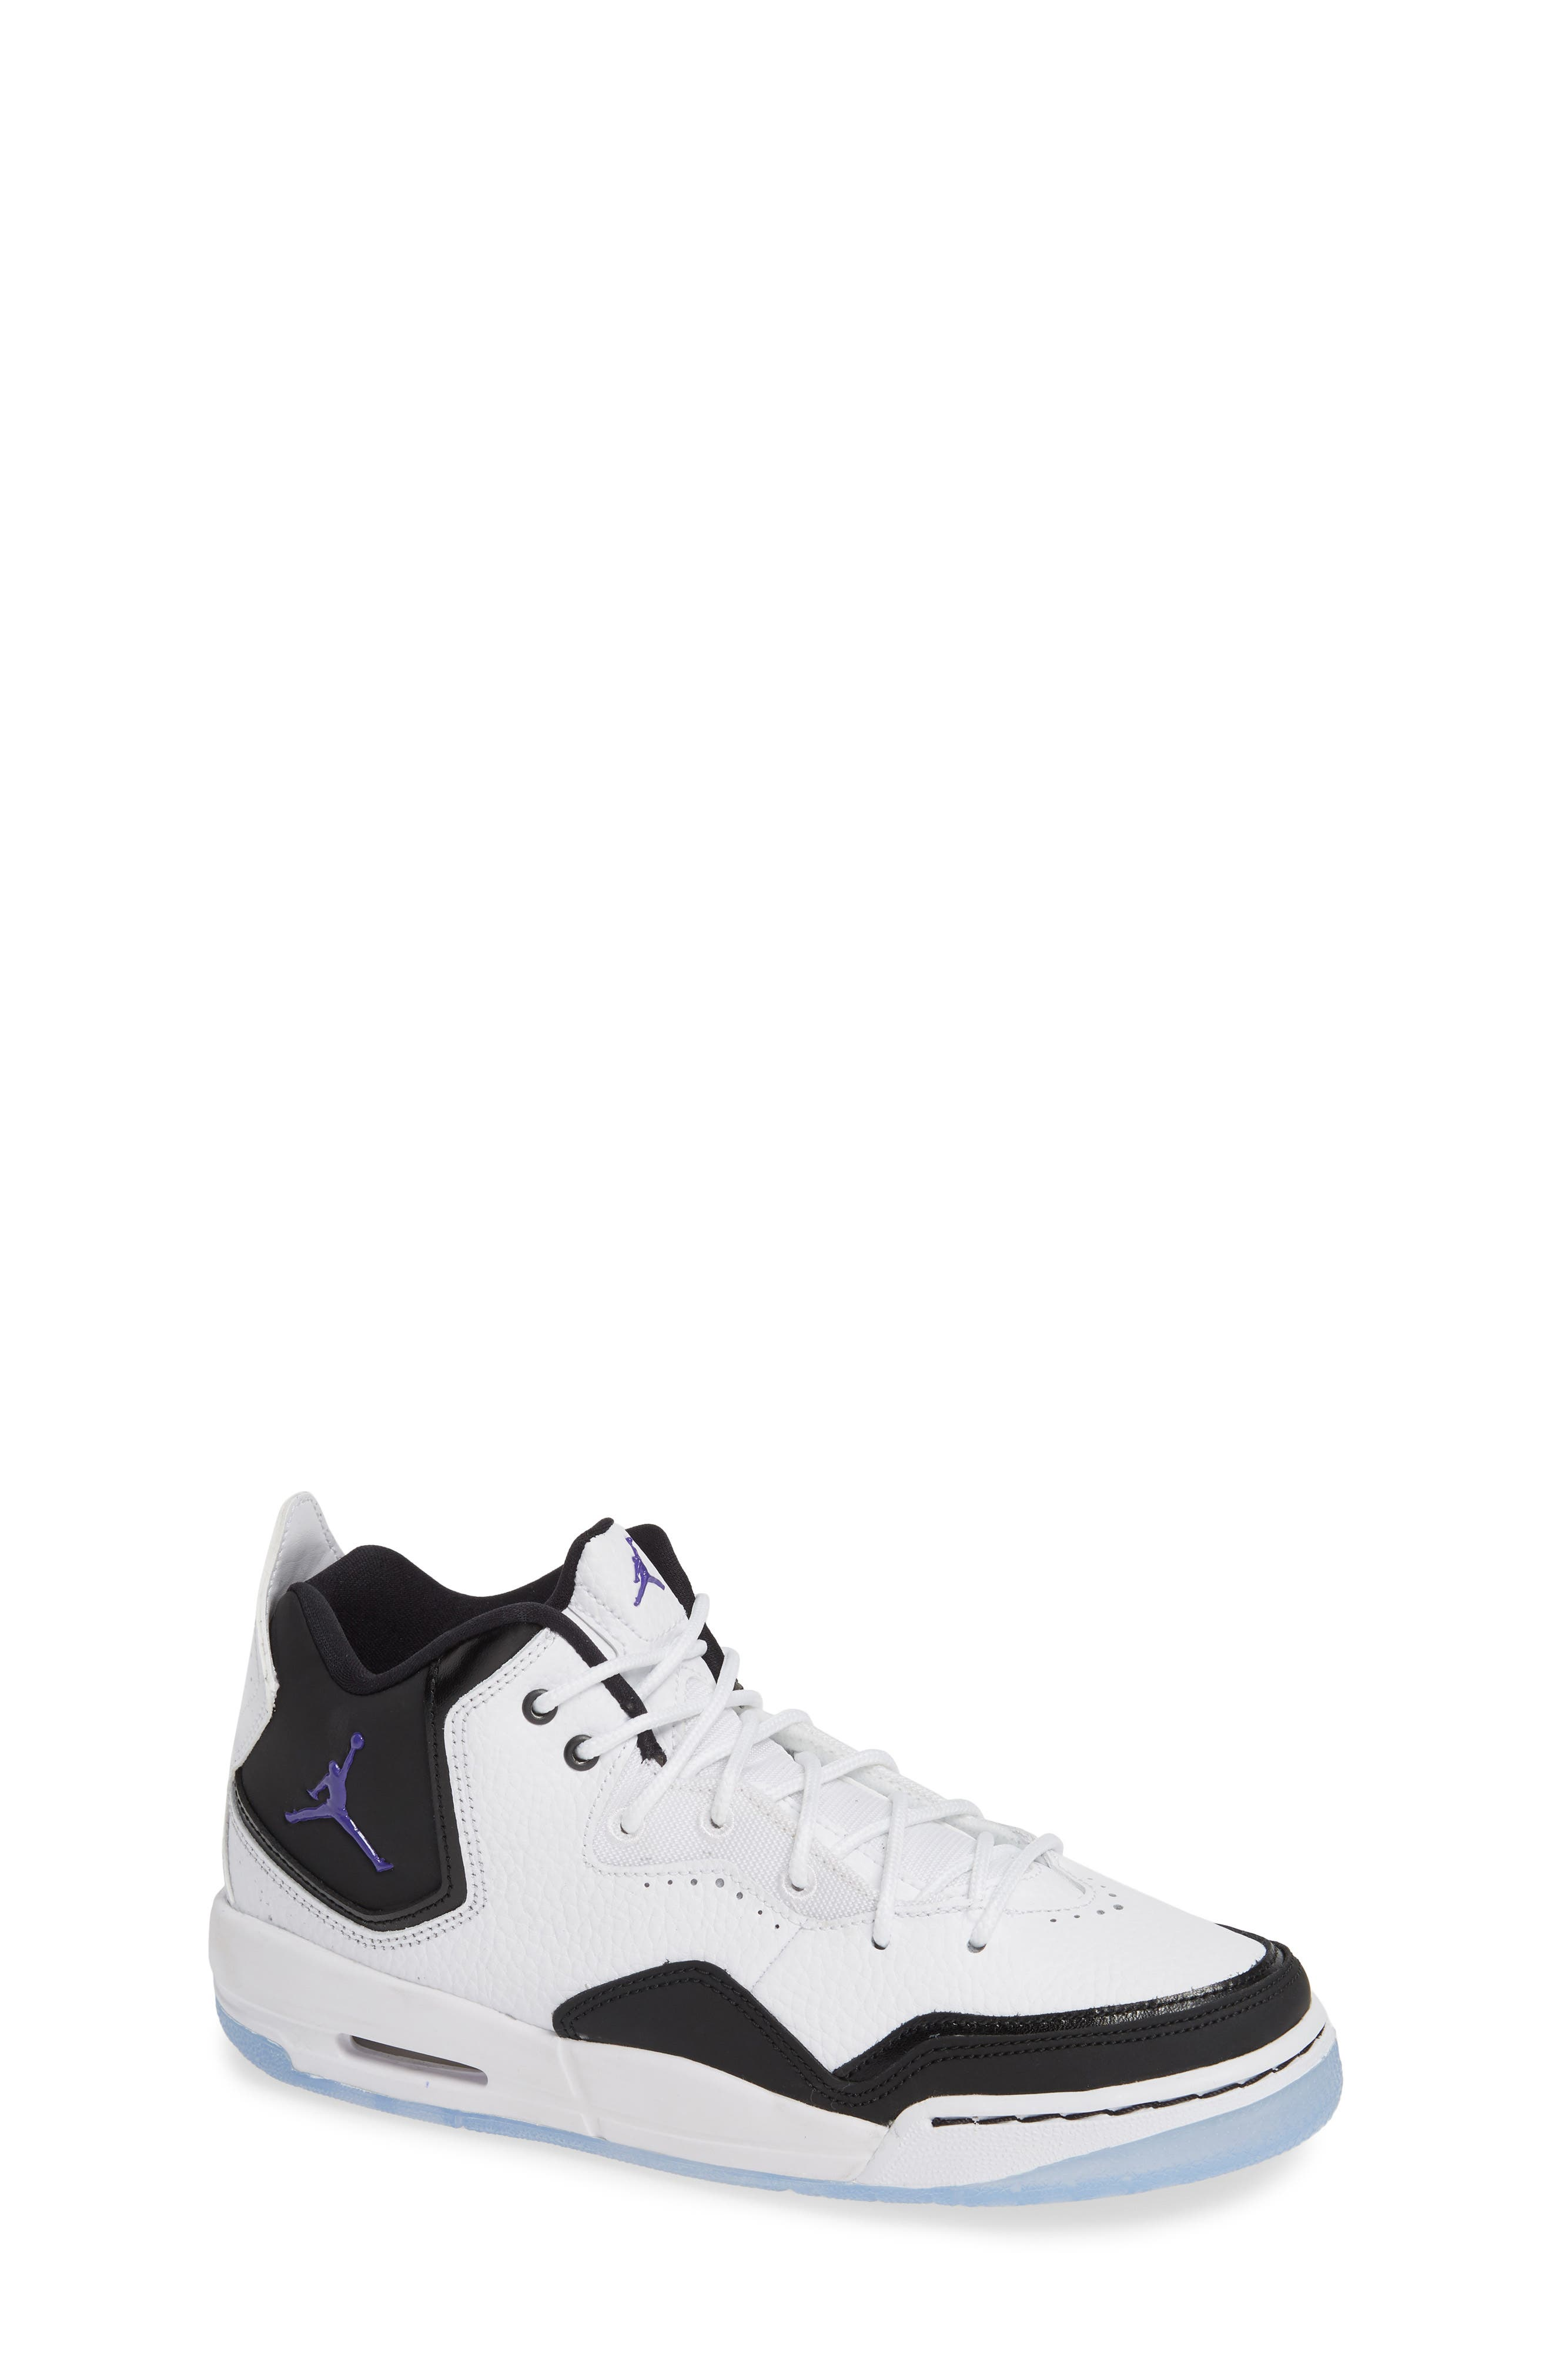 JORDAN, Nike Air Jordan Courtside 23 Sneaker, Main thumbnail 1, color, WHITE/ CONCORD BLACK